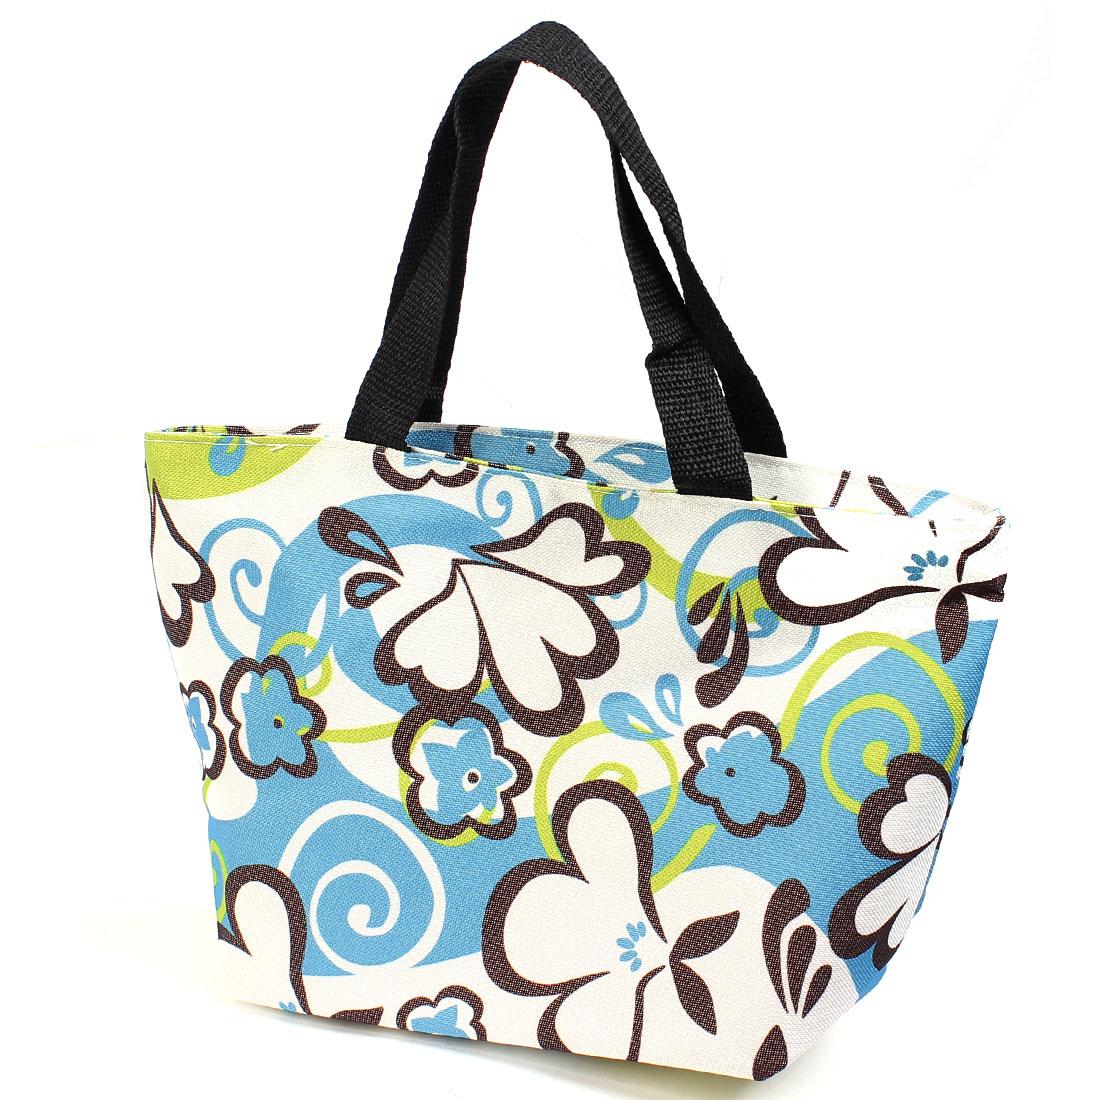 Portable White Blue Florals Printed Black Totes Shopping Bag Handbag